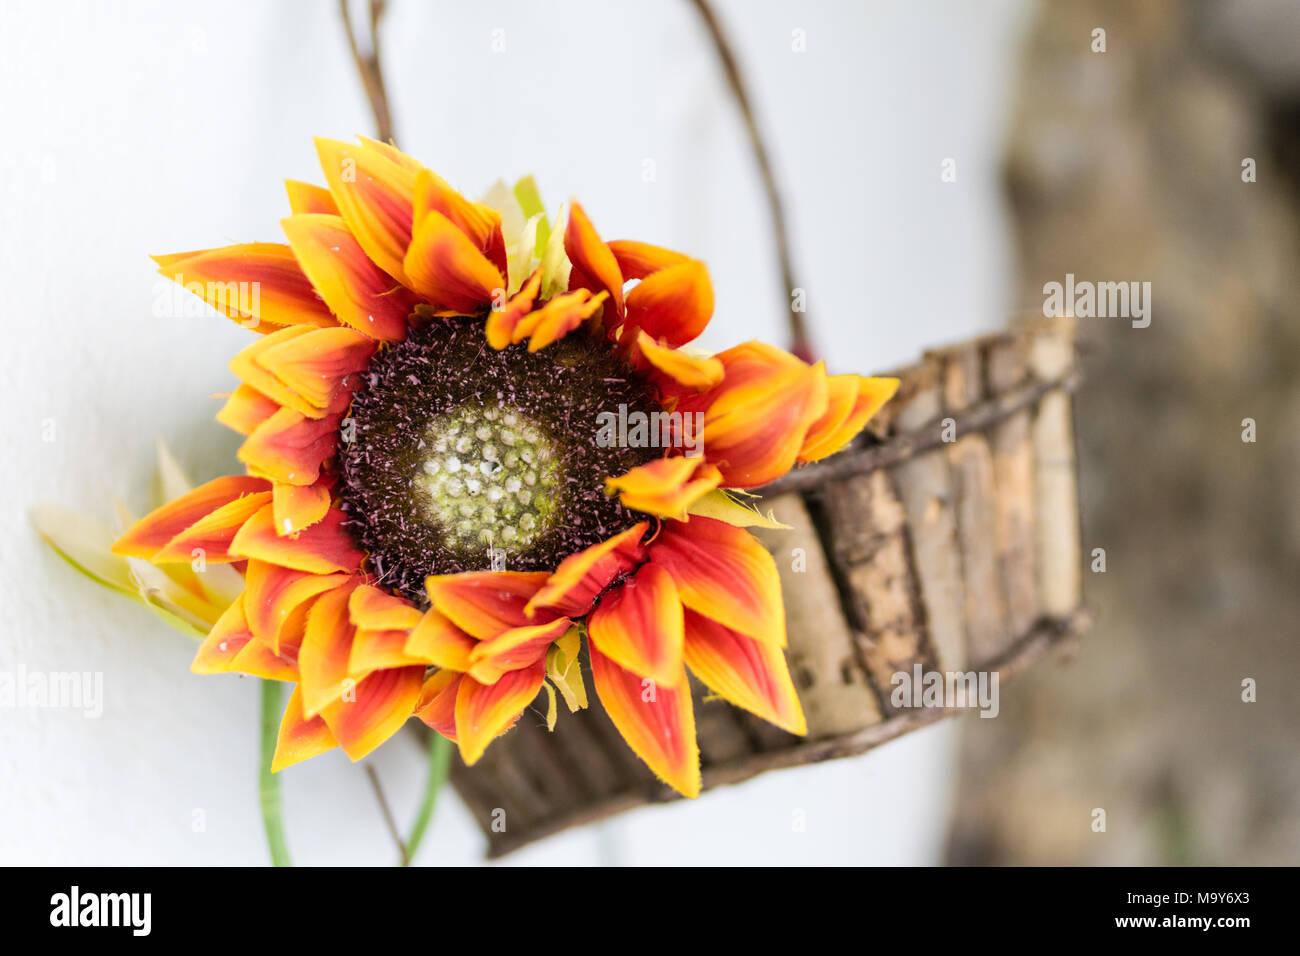 Sunflower in Basket - Stock Image